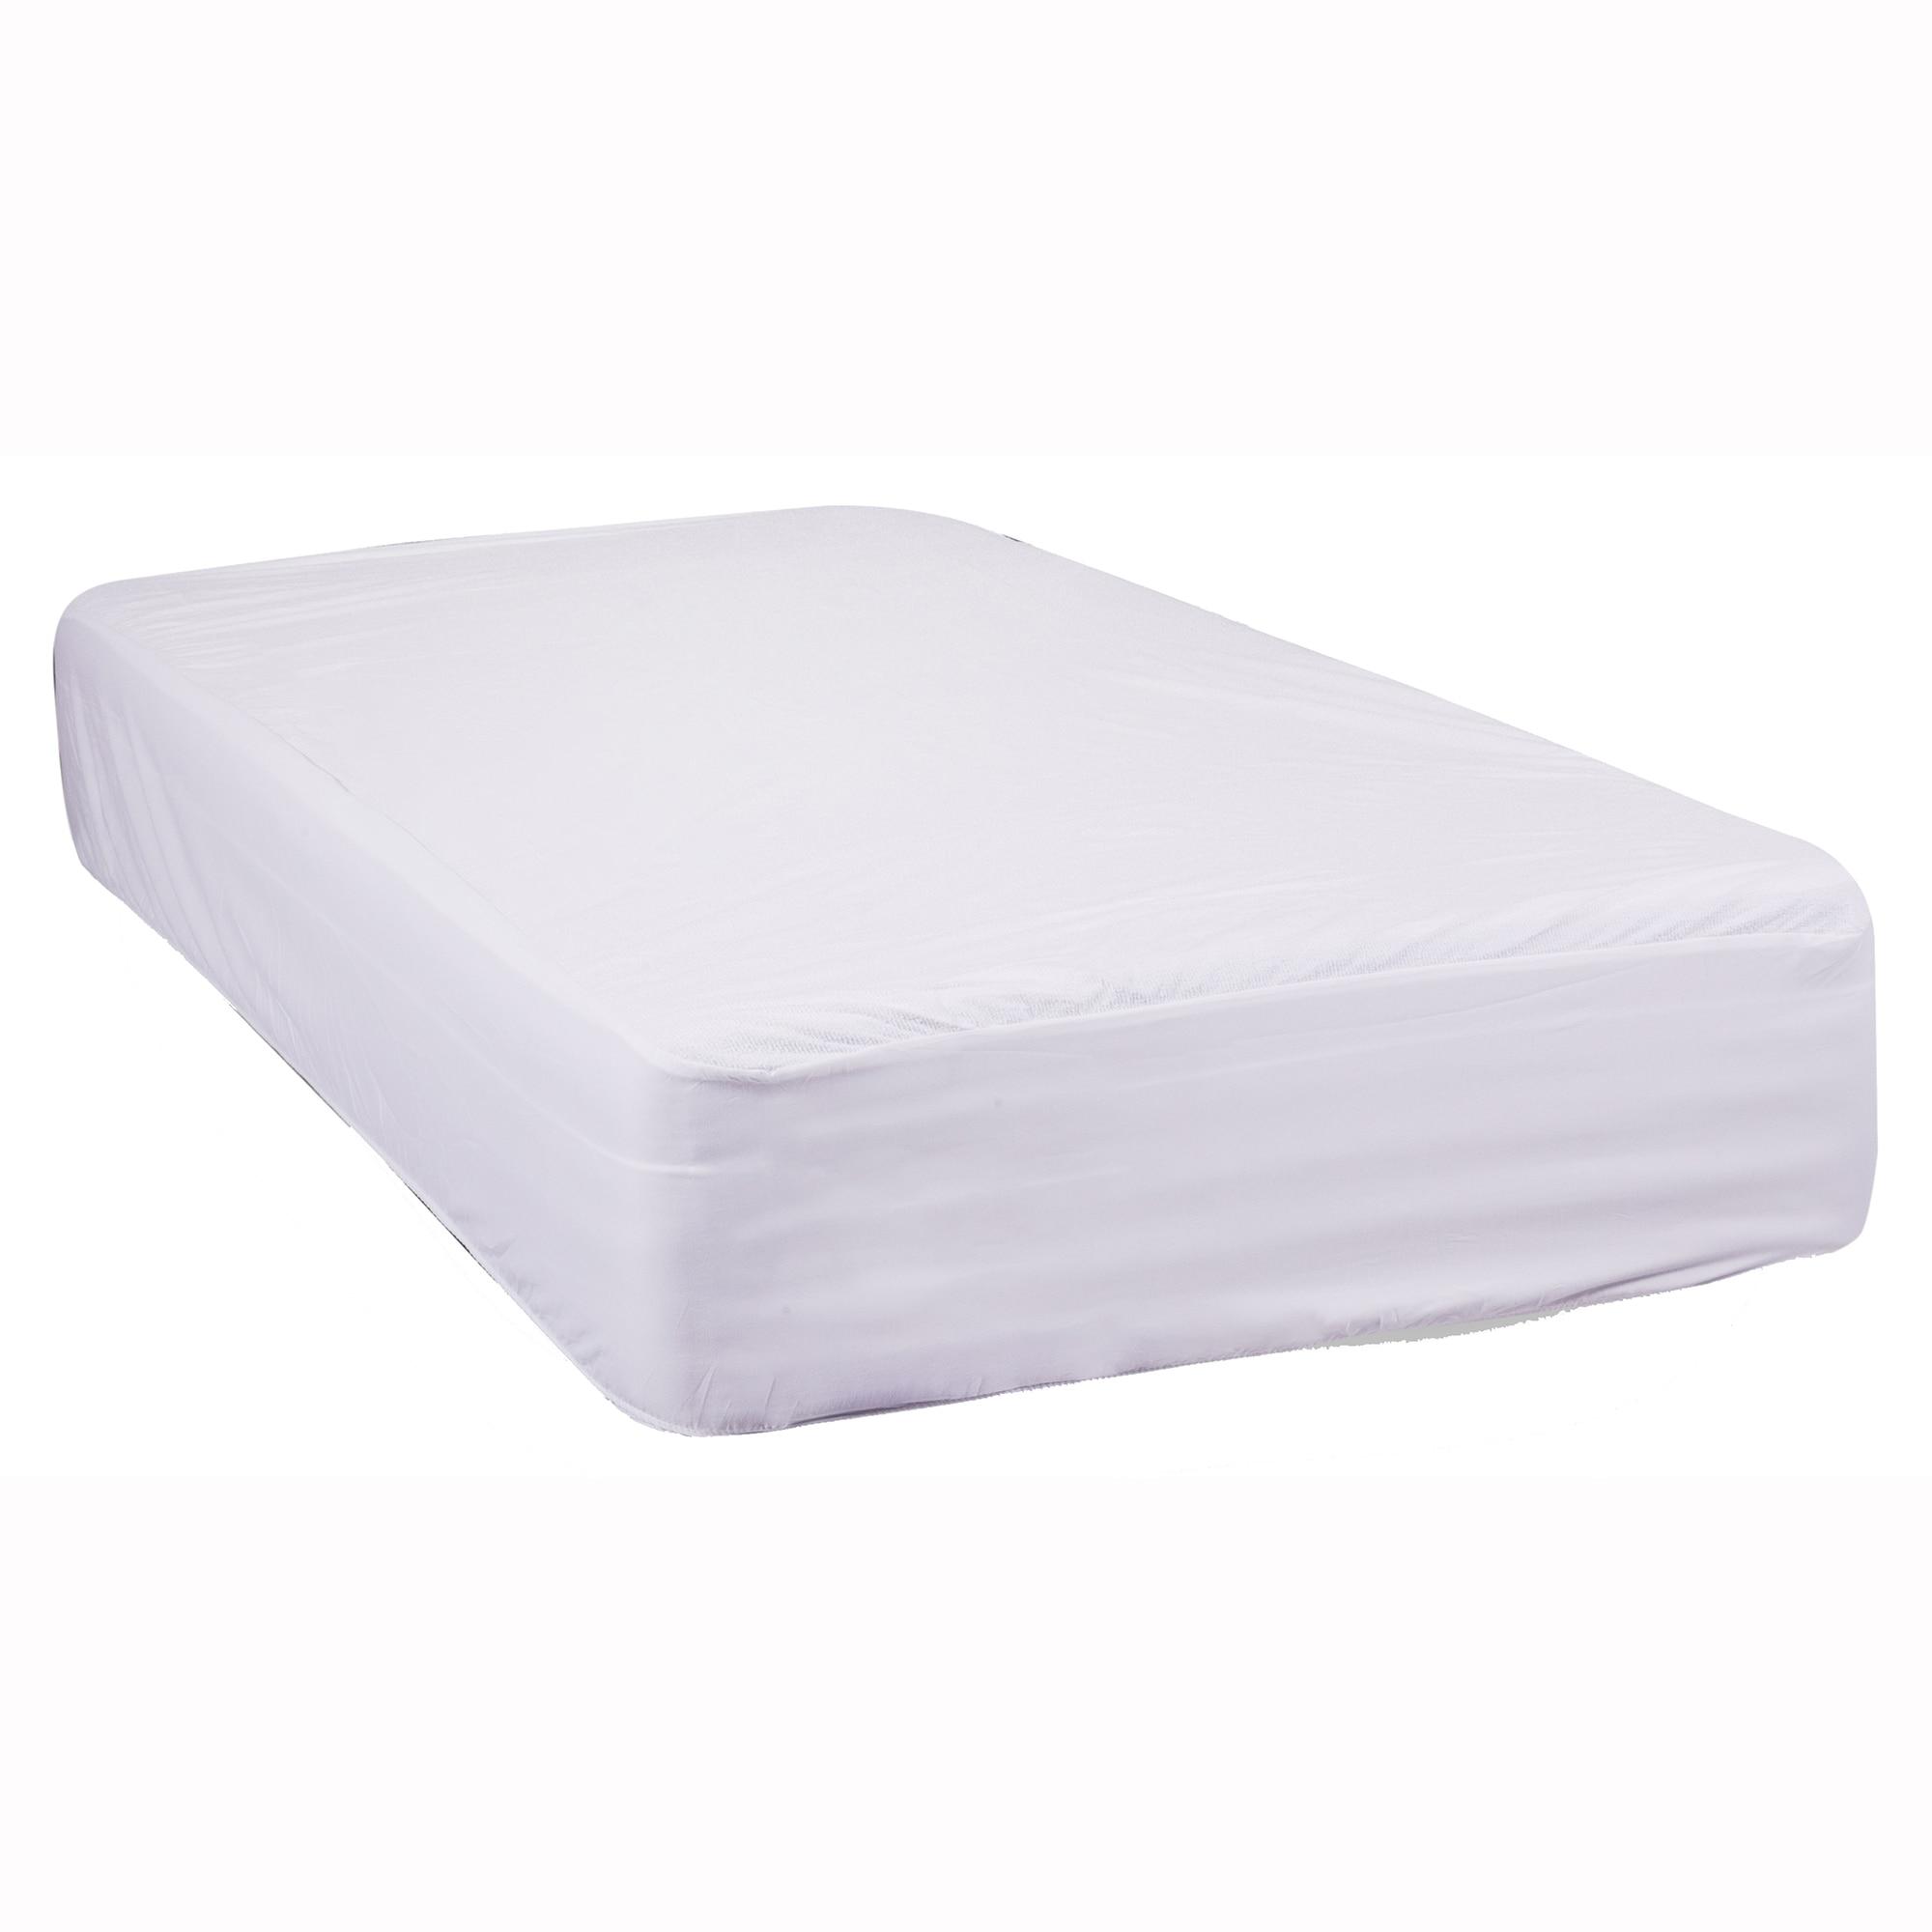 Fotografie Protectie saltea cu elastic Kring Gregal, impermeabila, 100% bumbac, cu baza de PVC, 140x200 cm